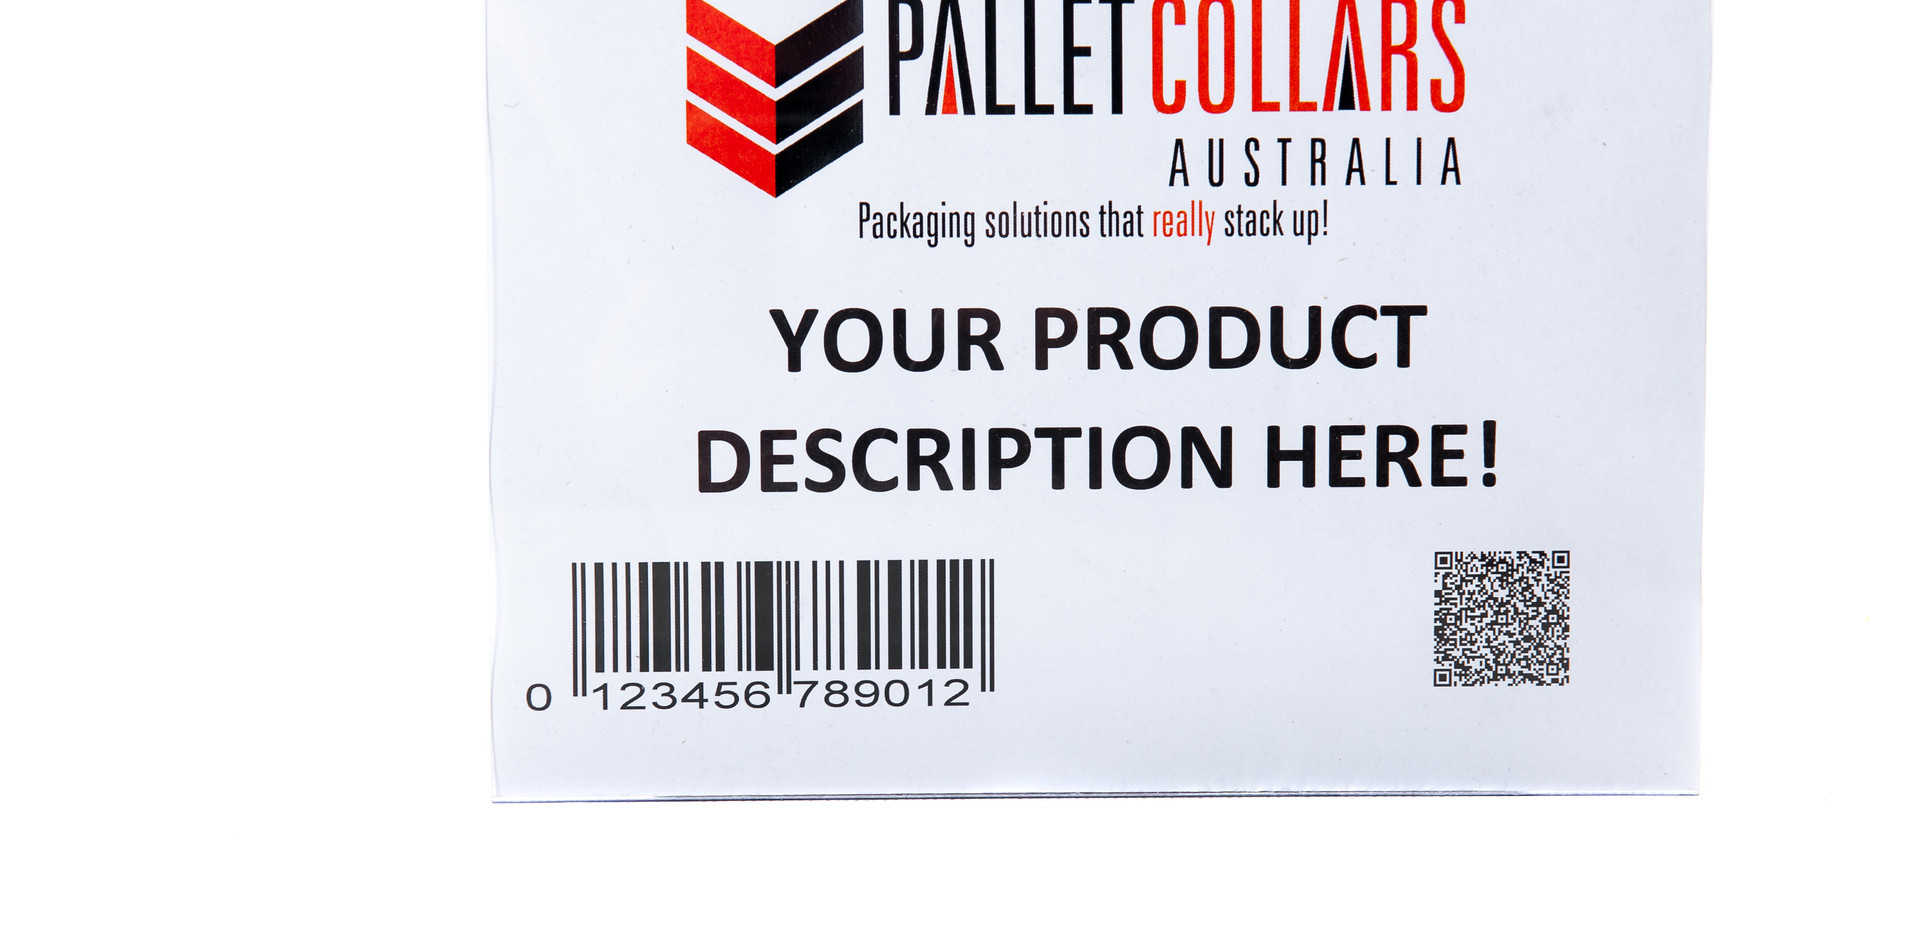 Pallet-Collars-Australia-124.jpg